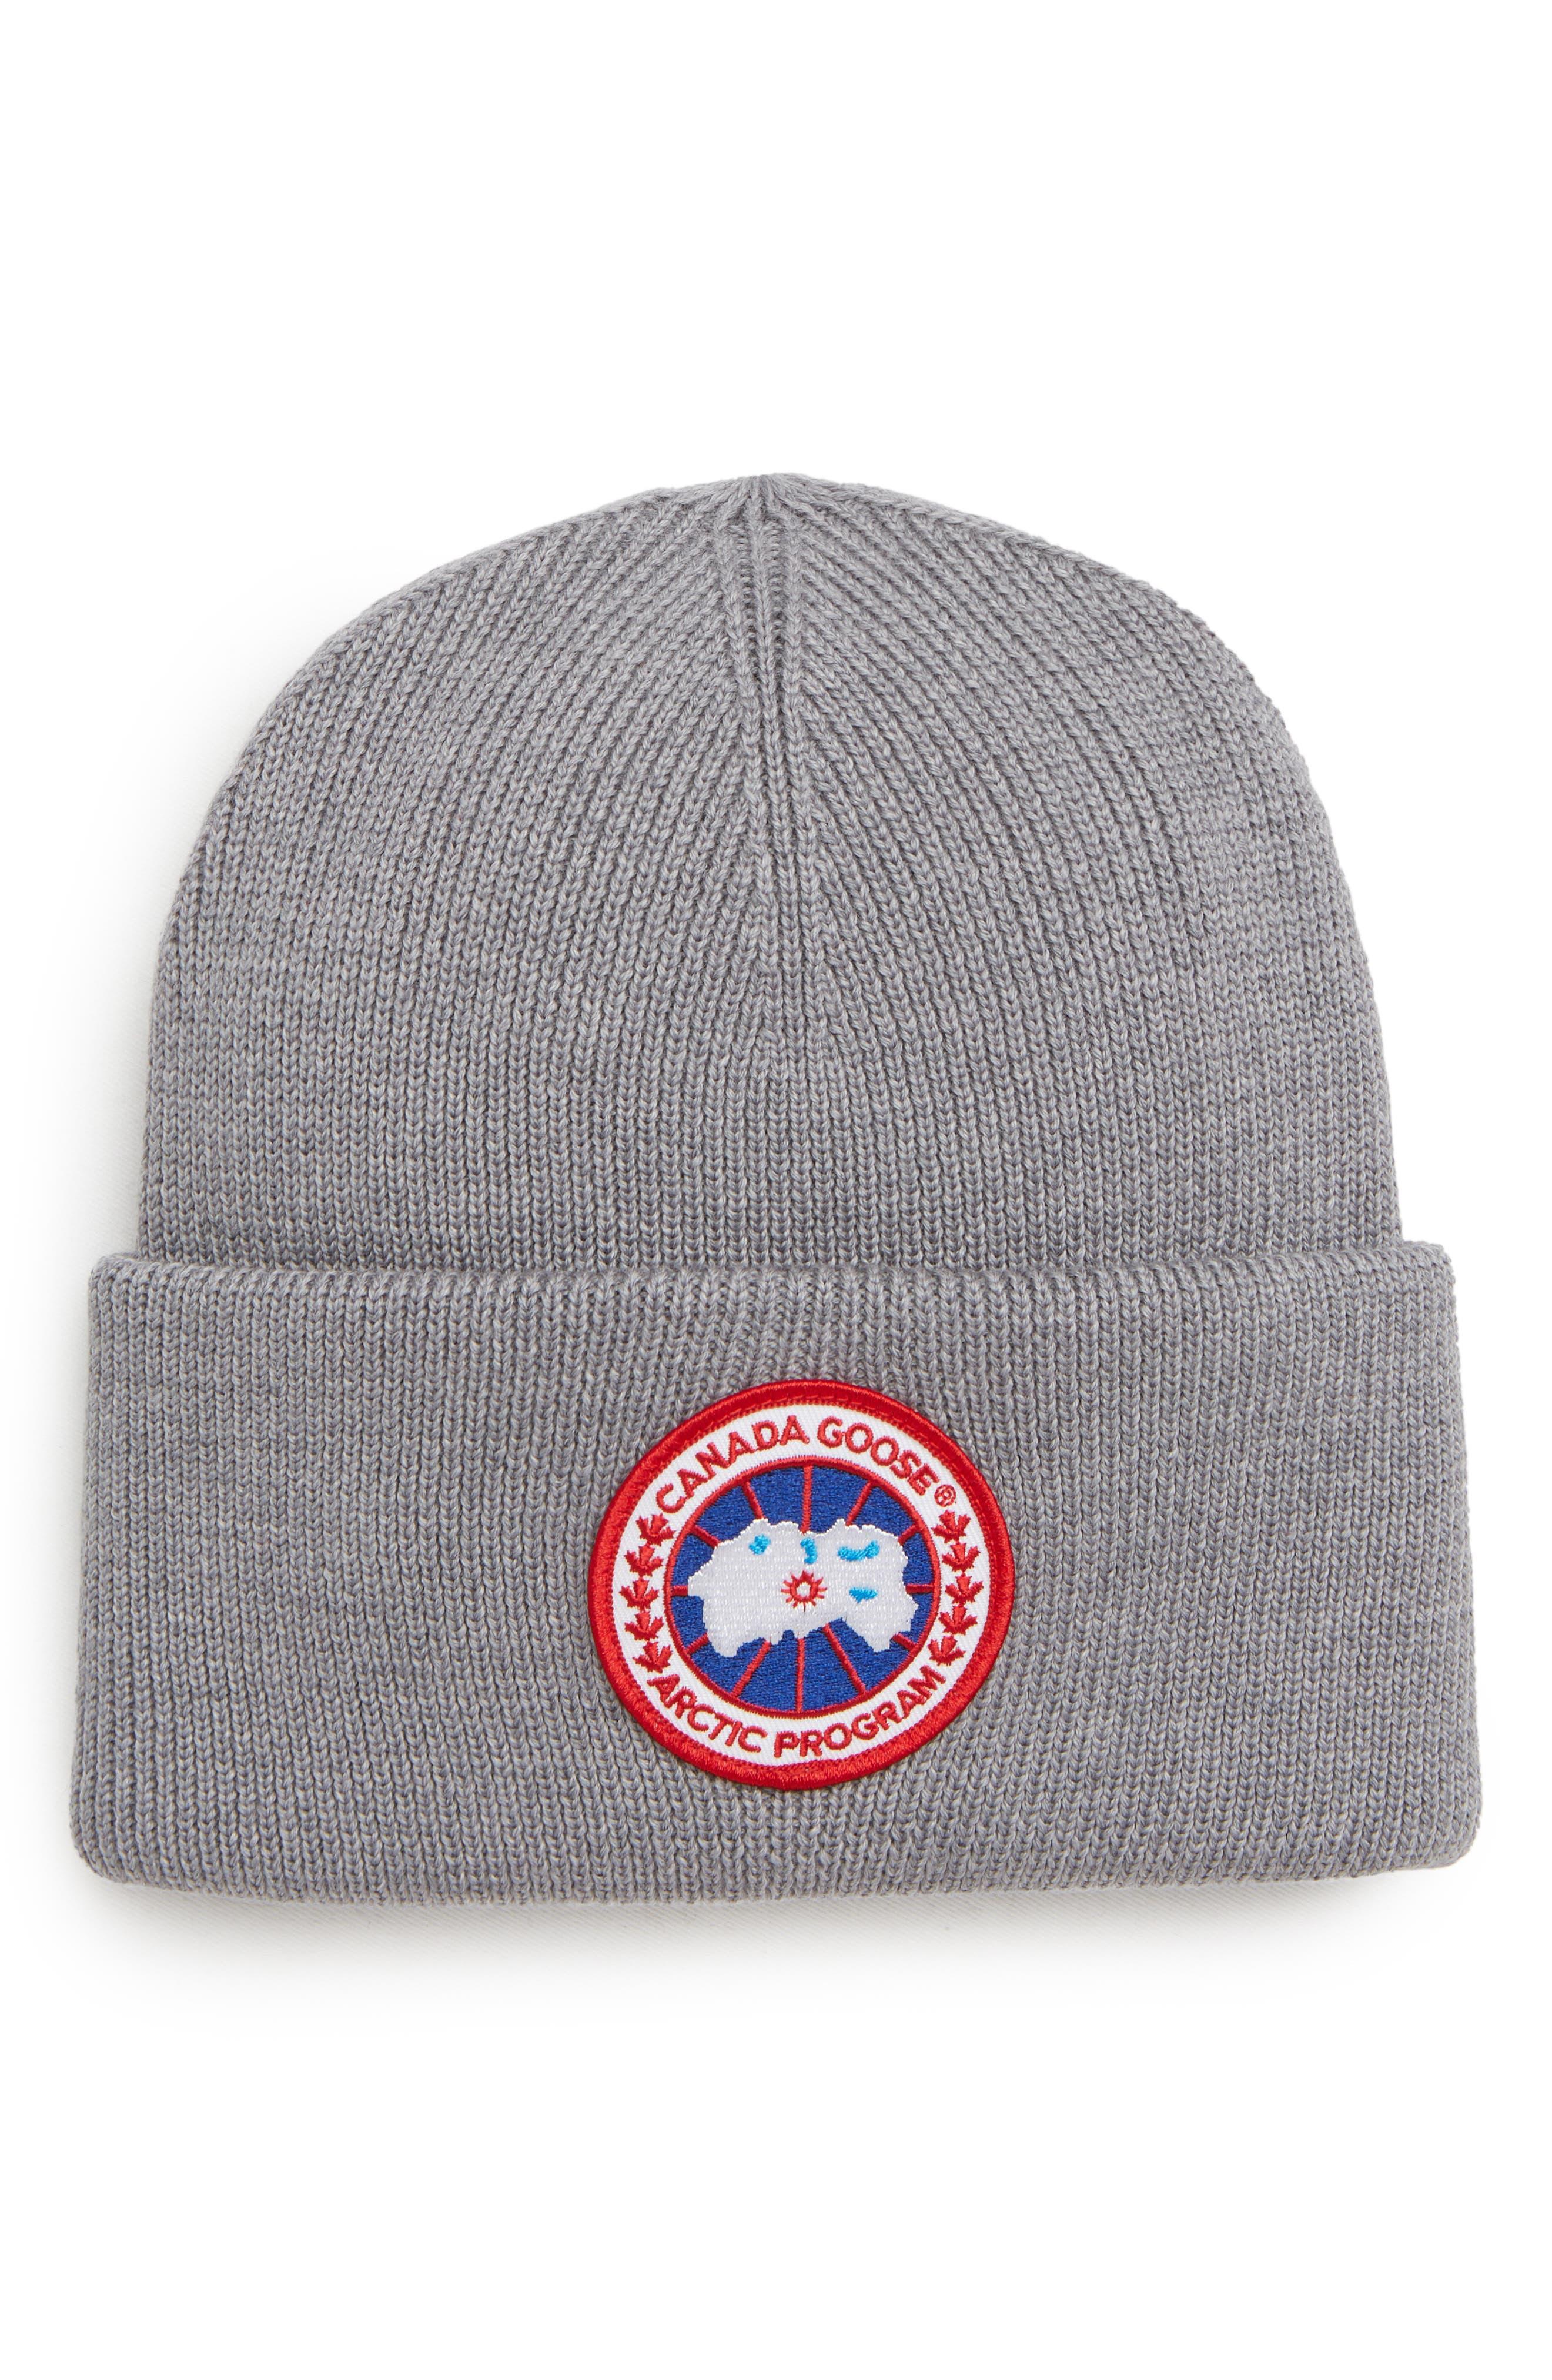 e6d66466ac56a Men s Grey Beanies  Knit Caps   Winter Hats